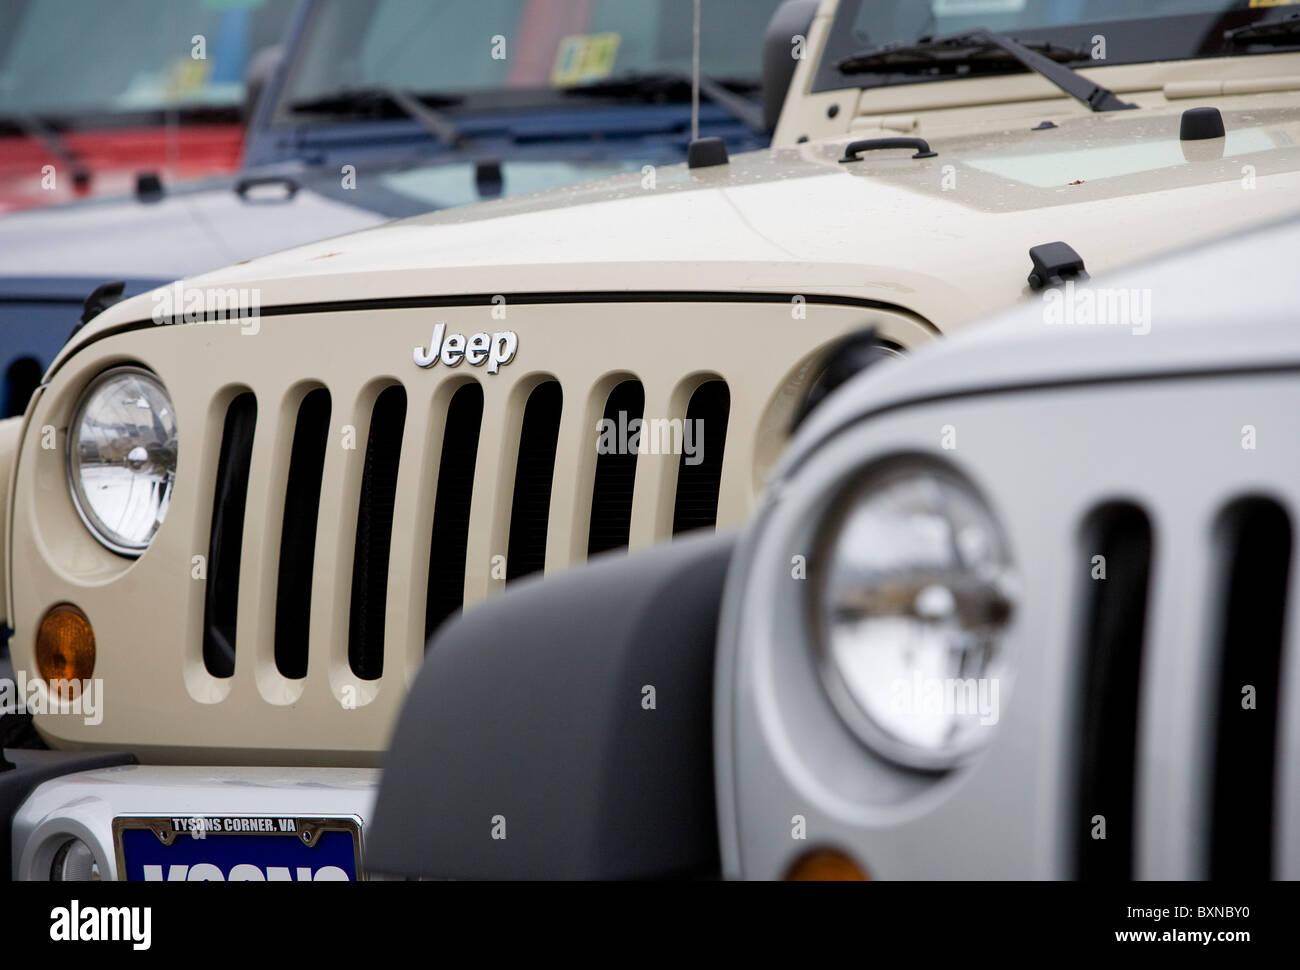 A Jeep car dealership.  - Stock Image